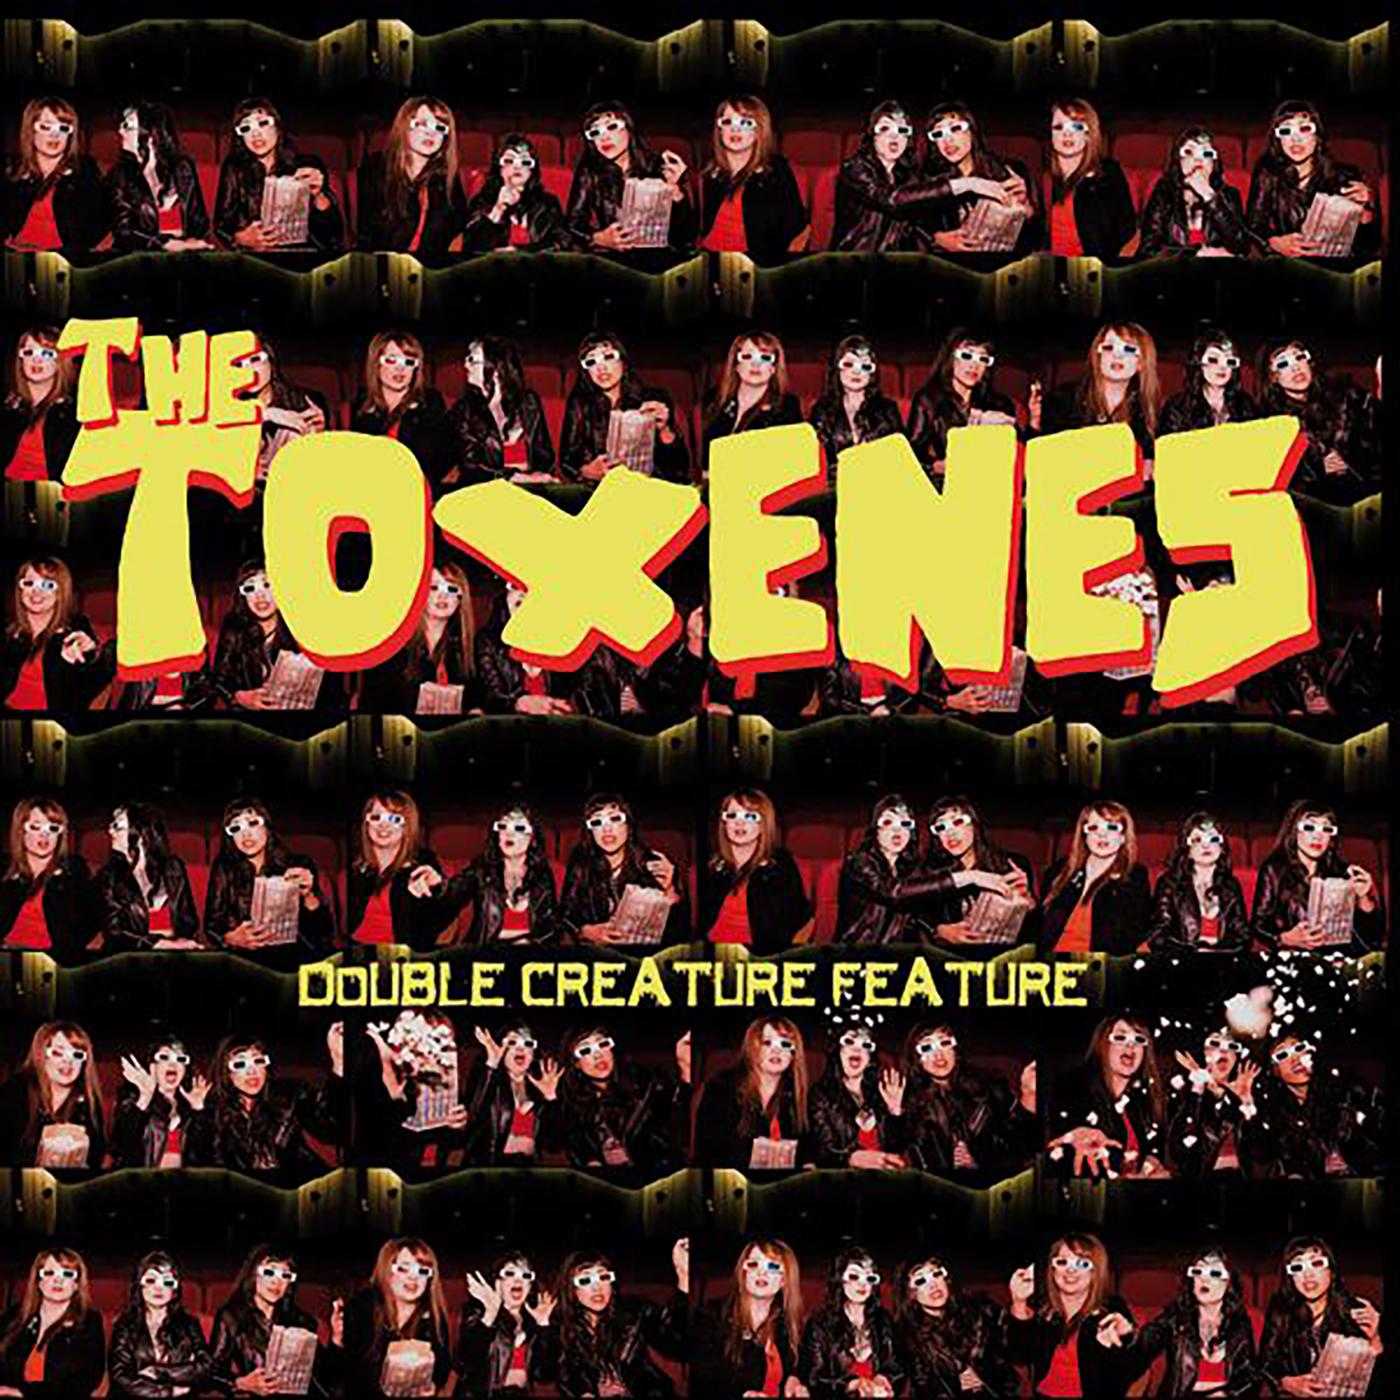 The Toxenes | Double Creature Feature | Killjoy Records